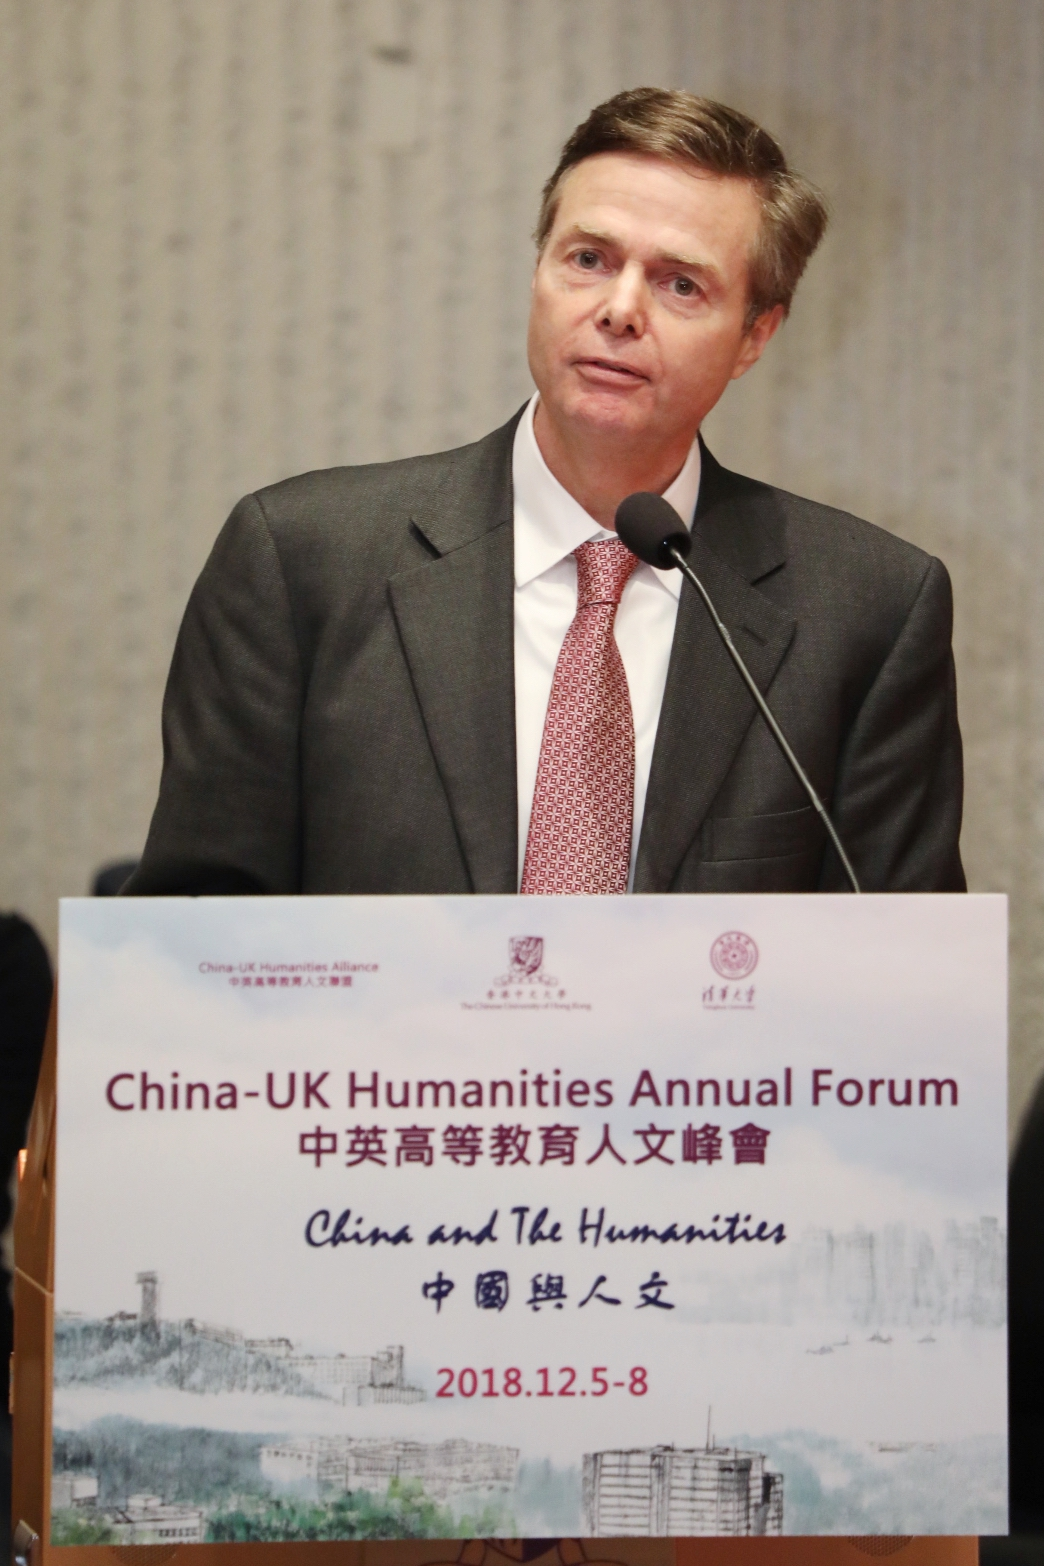 Mr. Jeff STREETER, Director, British Council, Hong Kong